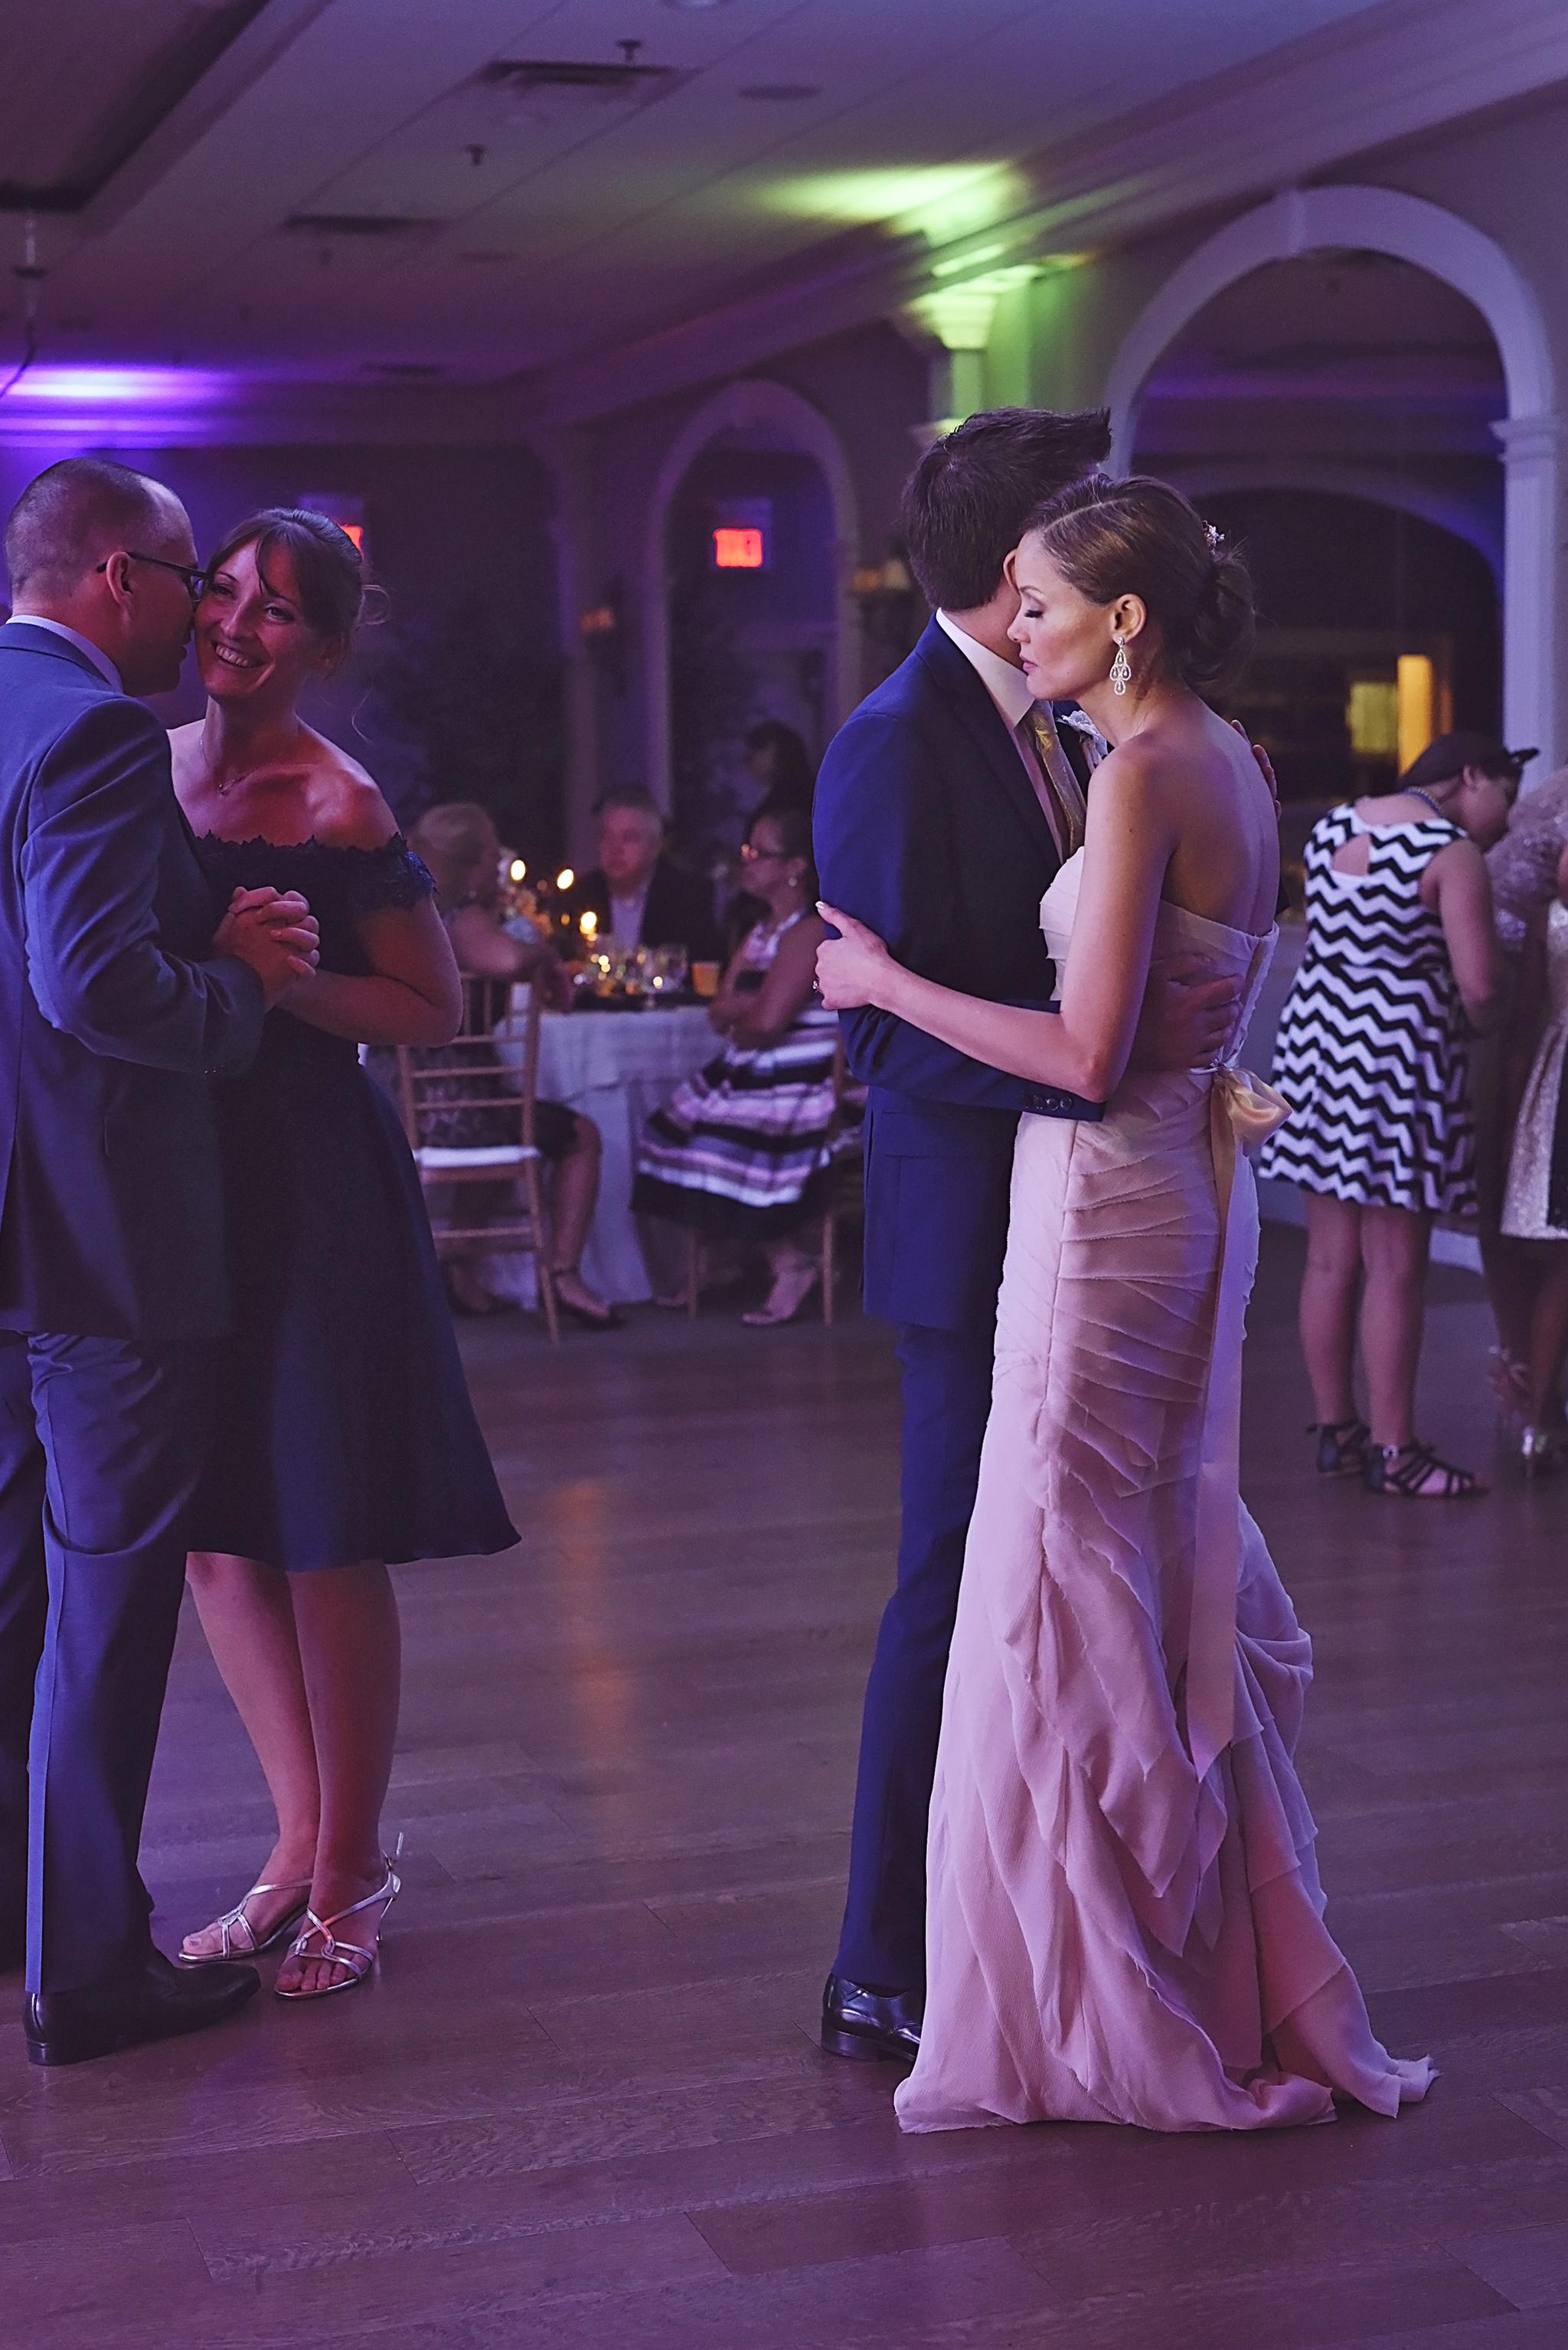 NJ-NY-wedding-photographer-171NJ-NY-wedding-photographer-171NJ-NY-WEDDING-PHOTOGRAPHER-171.JPG